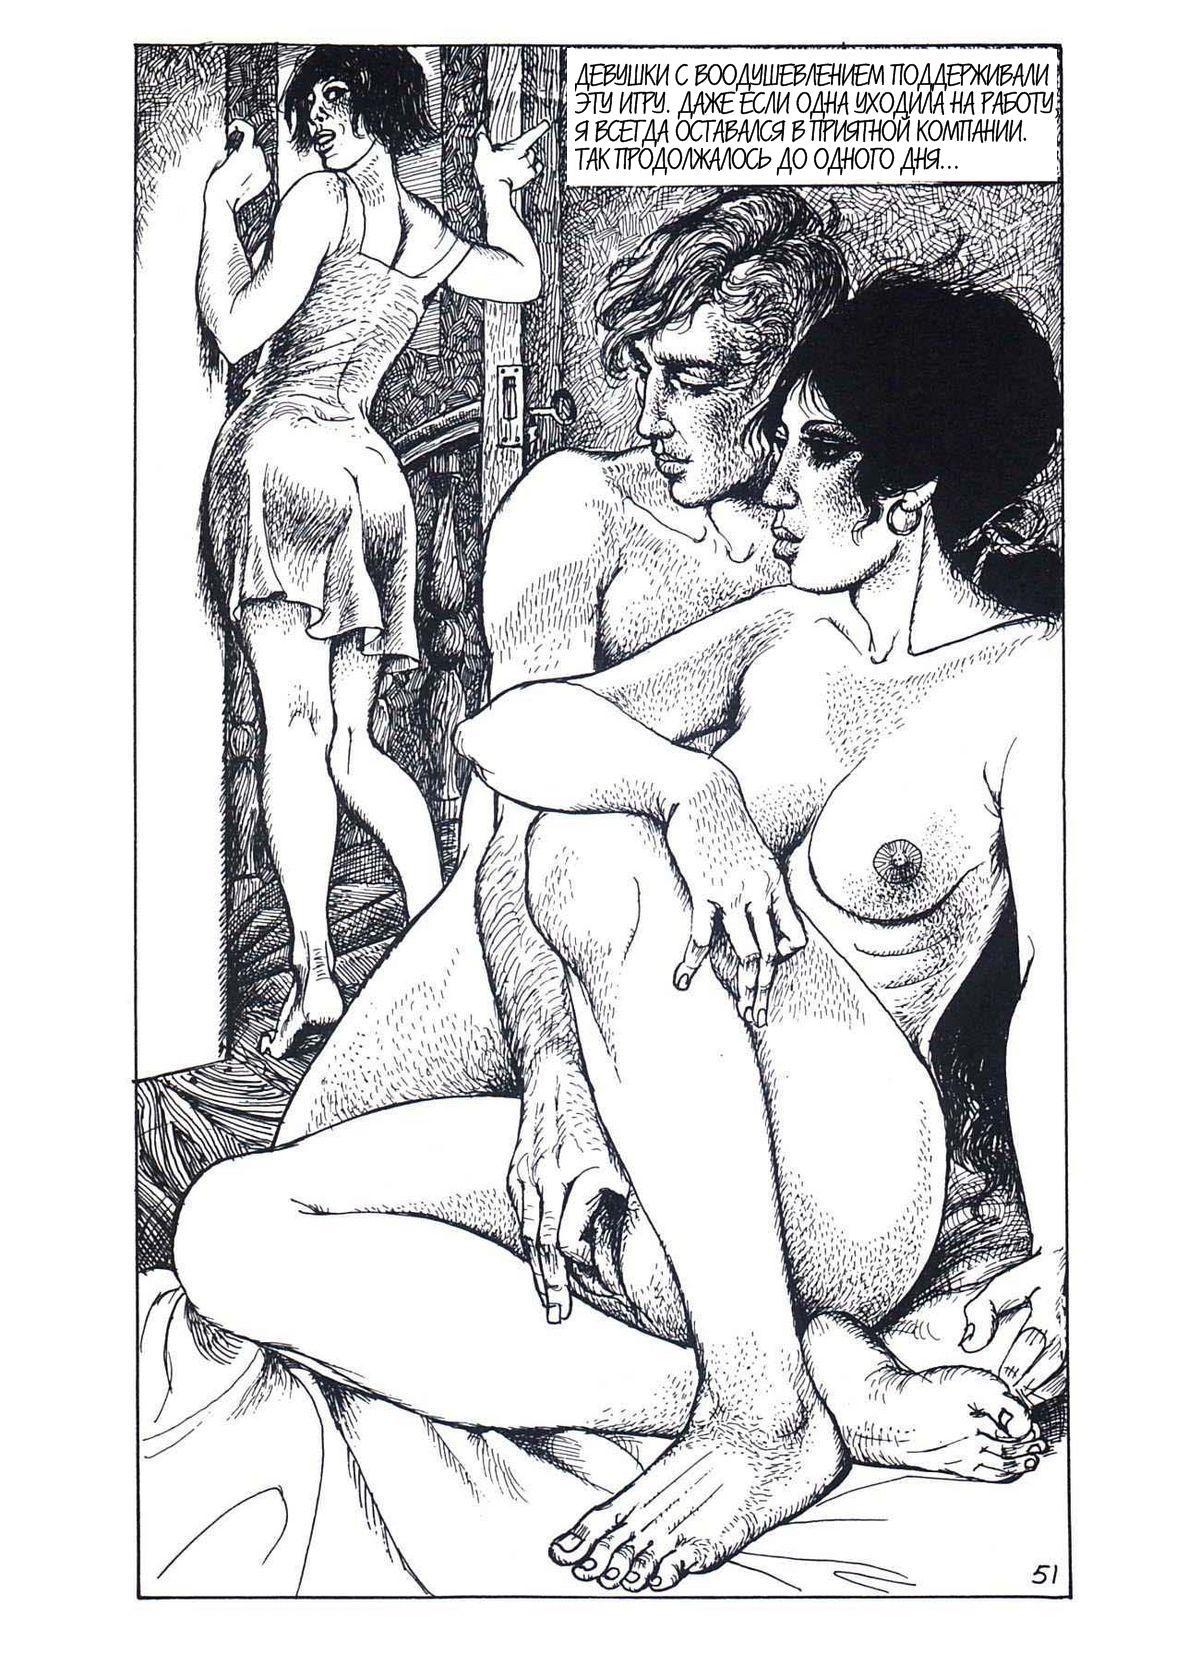 salon-eroticheskogo-massazha-erotic-massage